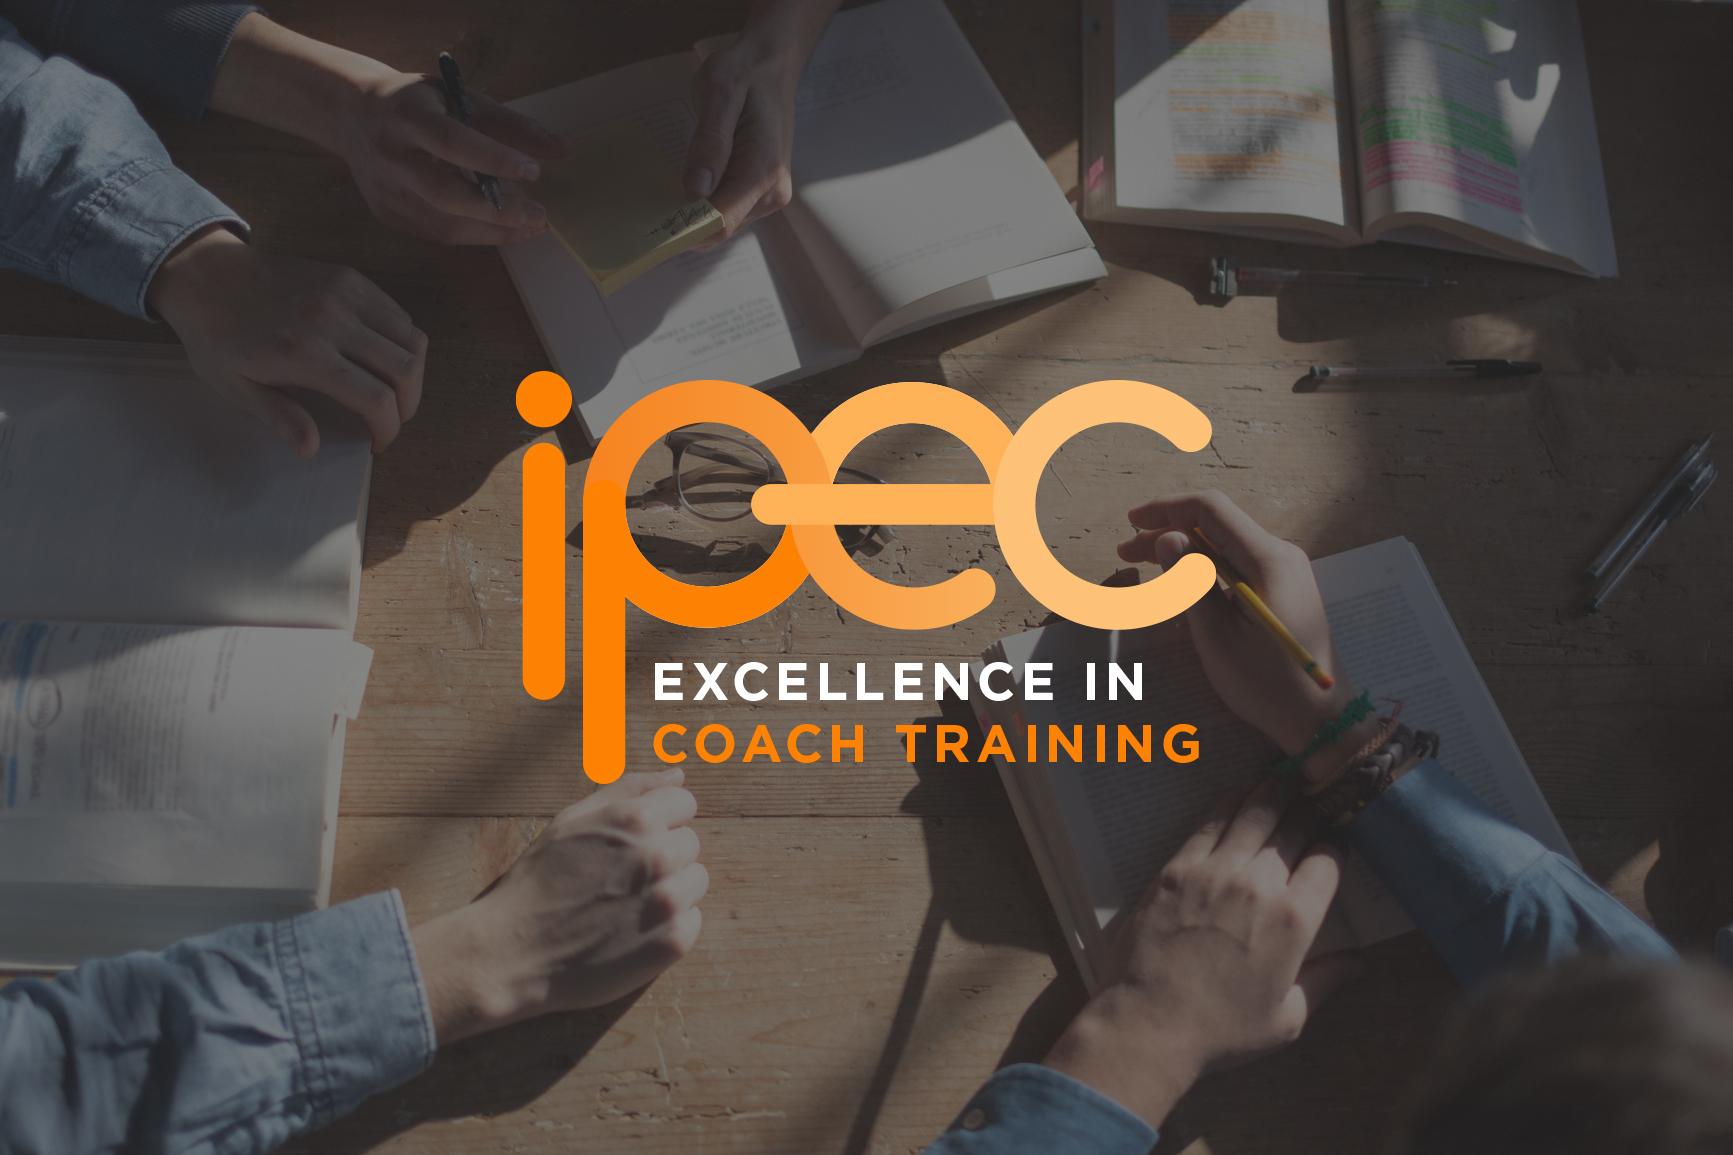 ipec-logo-life-rounded.jpg